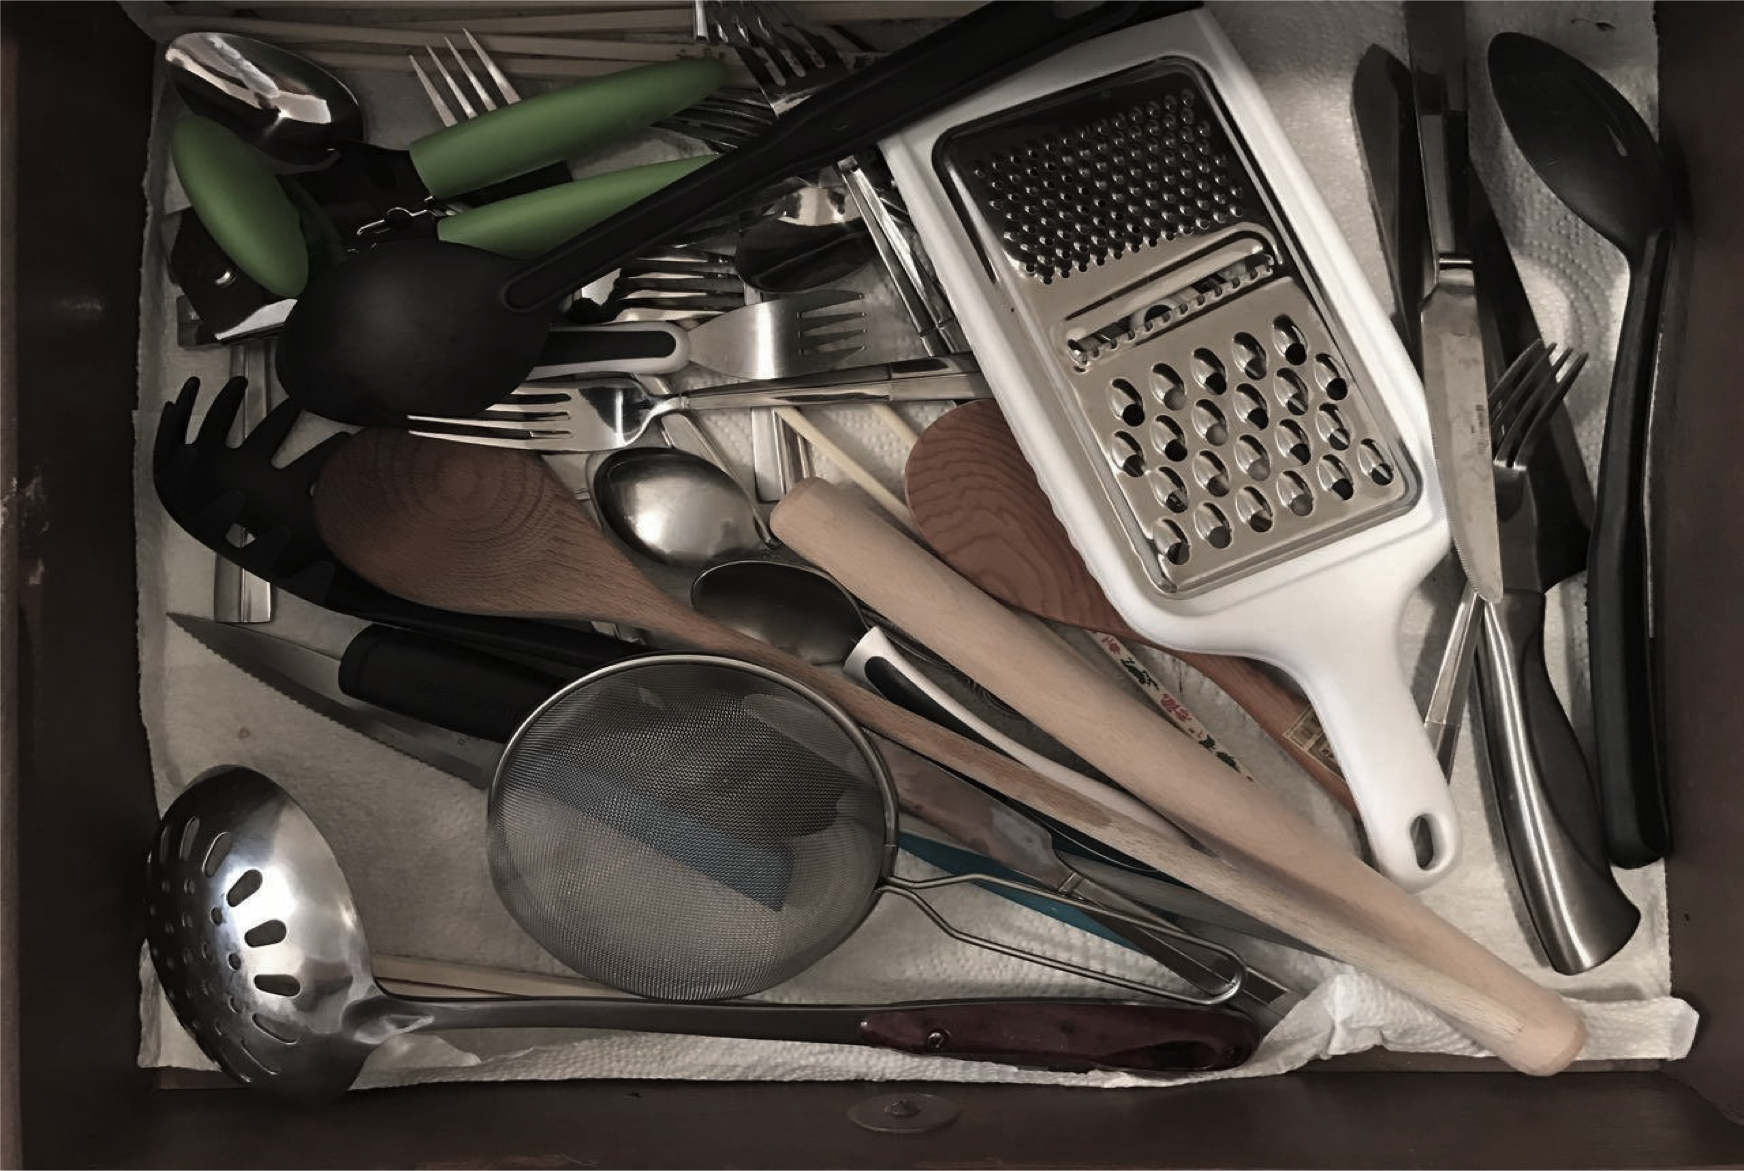 Average utensils and materials